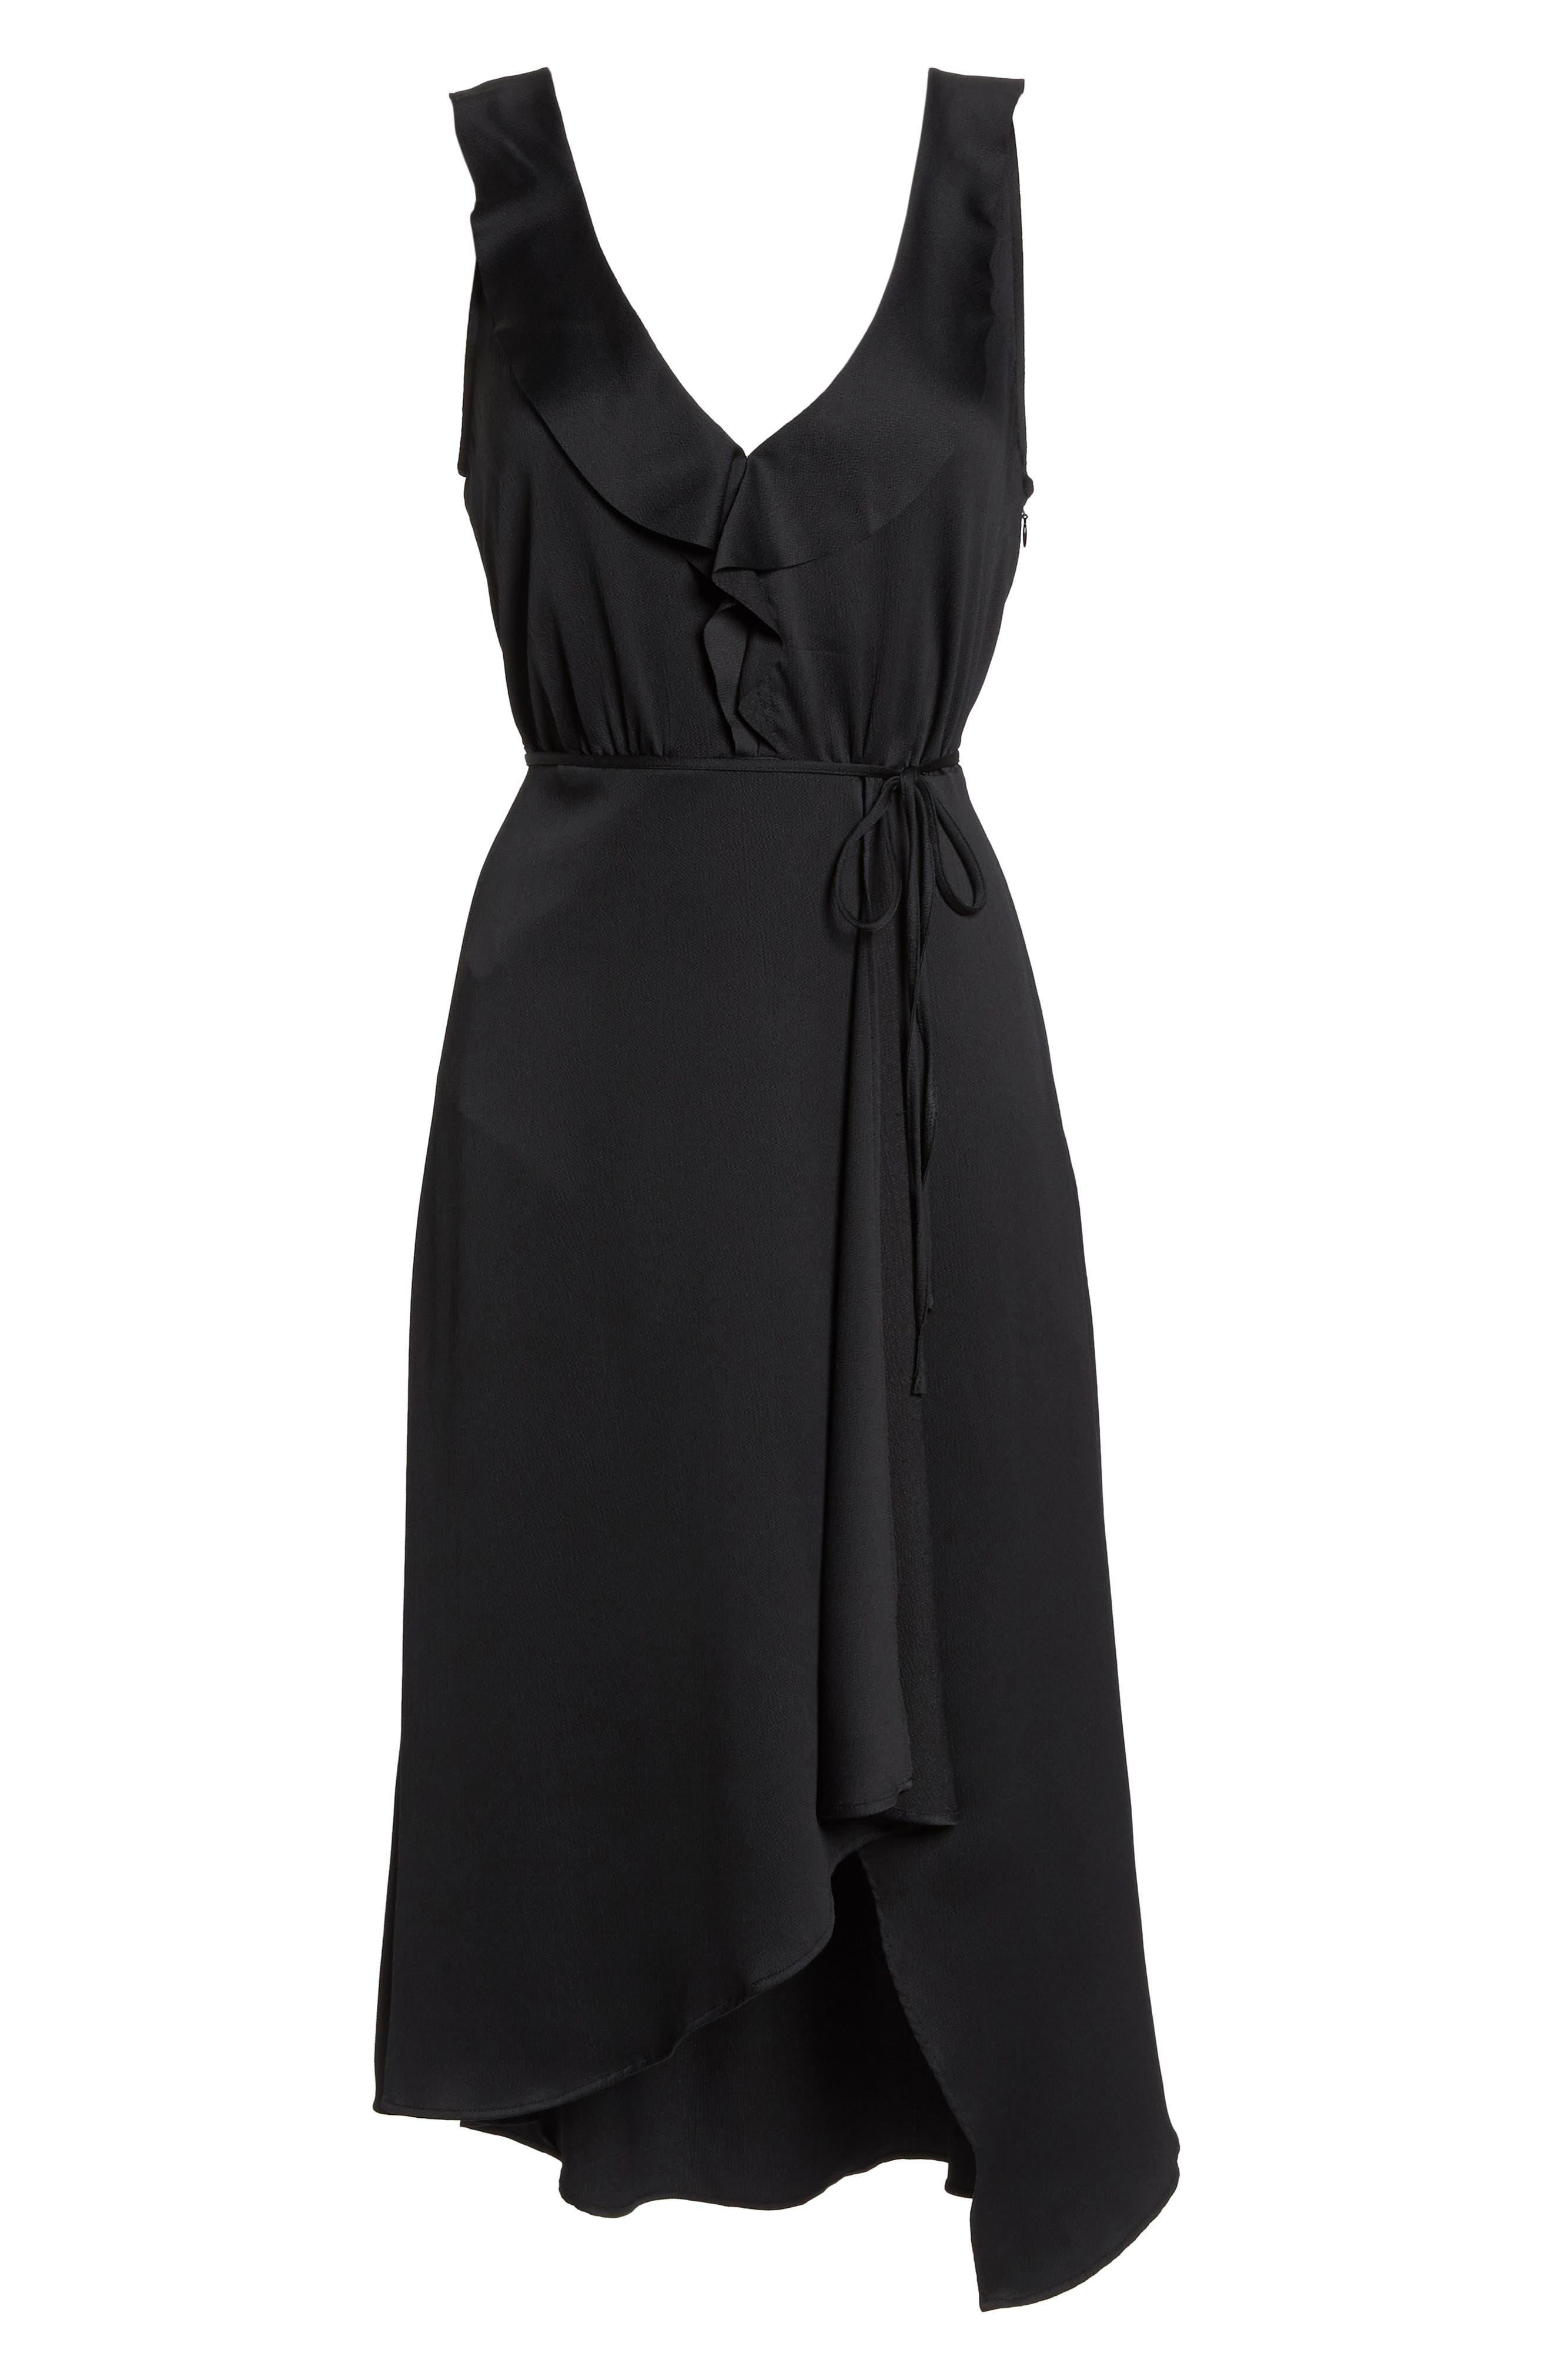 Maudie Ruffle Midi Dress,                             Alternate thumbnail 7, color,                             Black